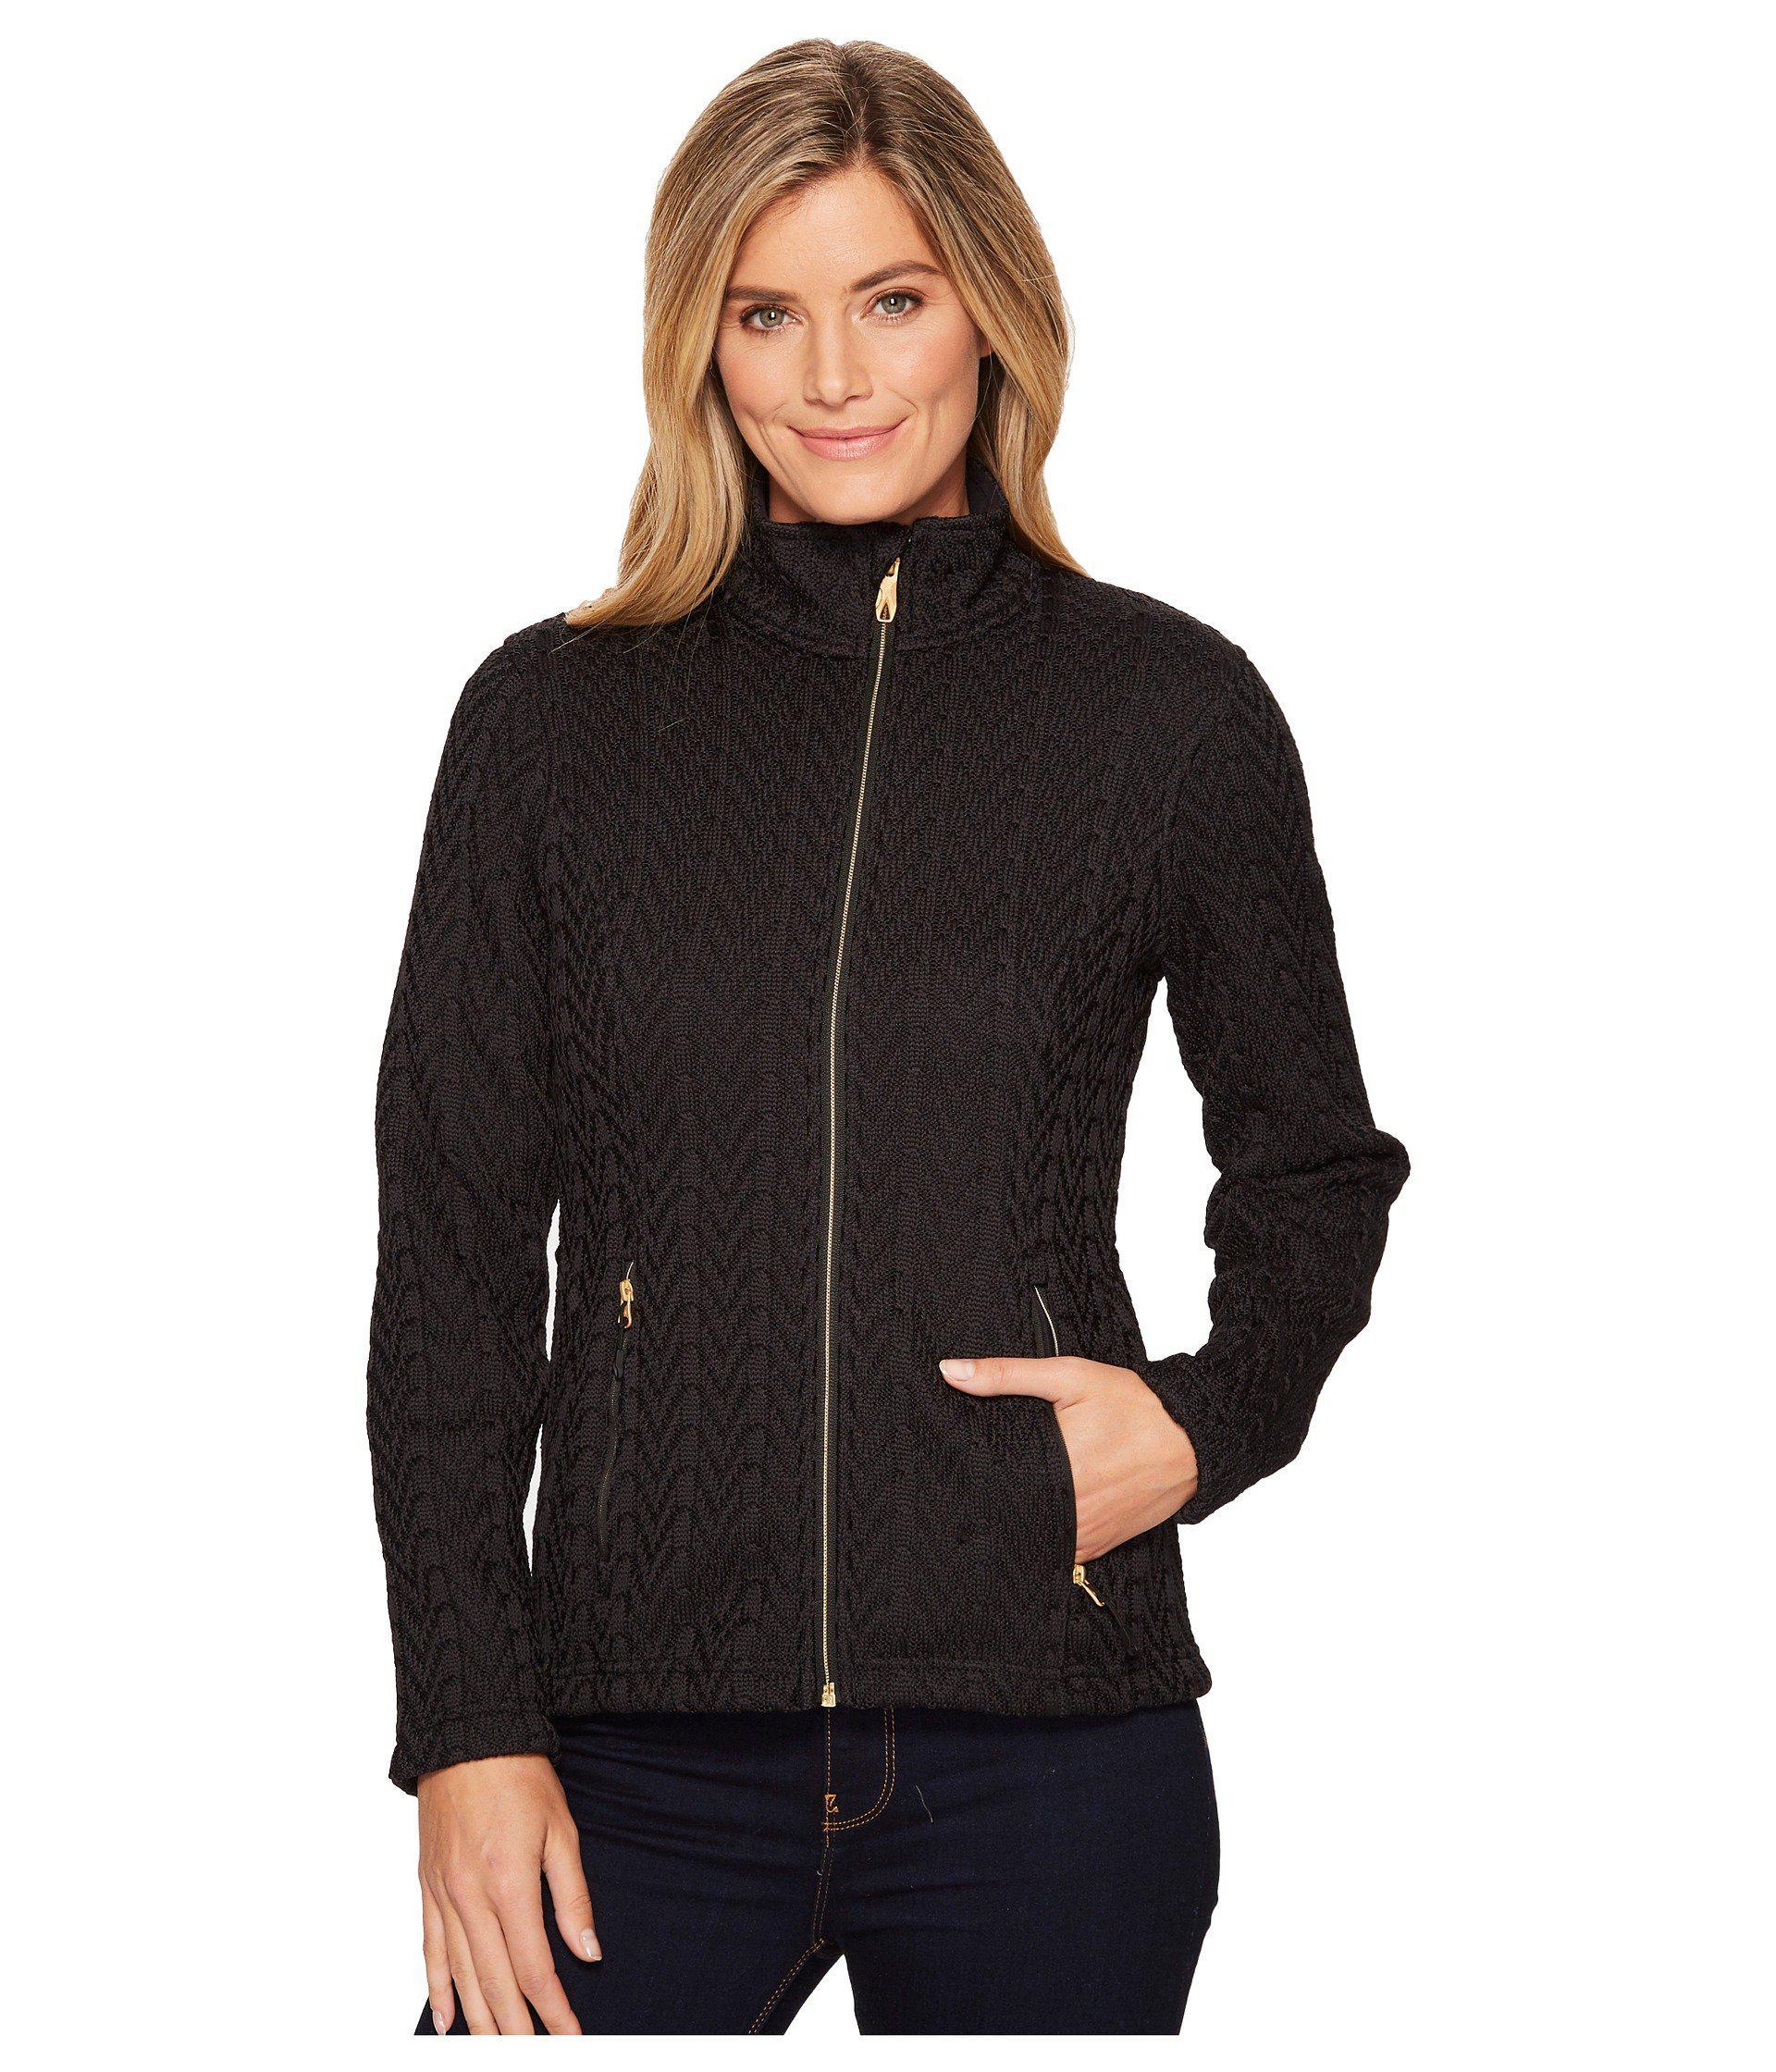 Spyder Women/'s Major Cable Stryke Jacket